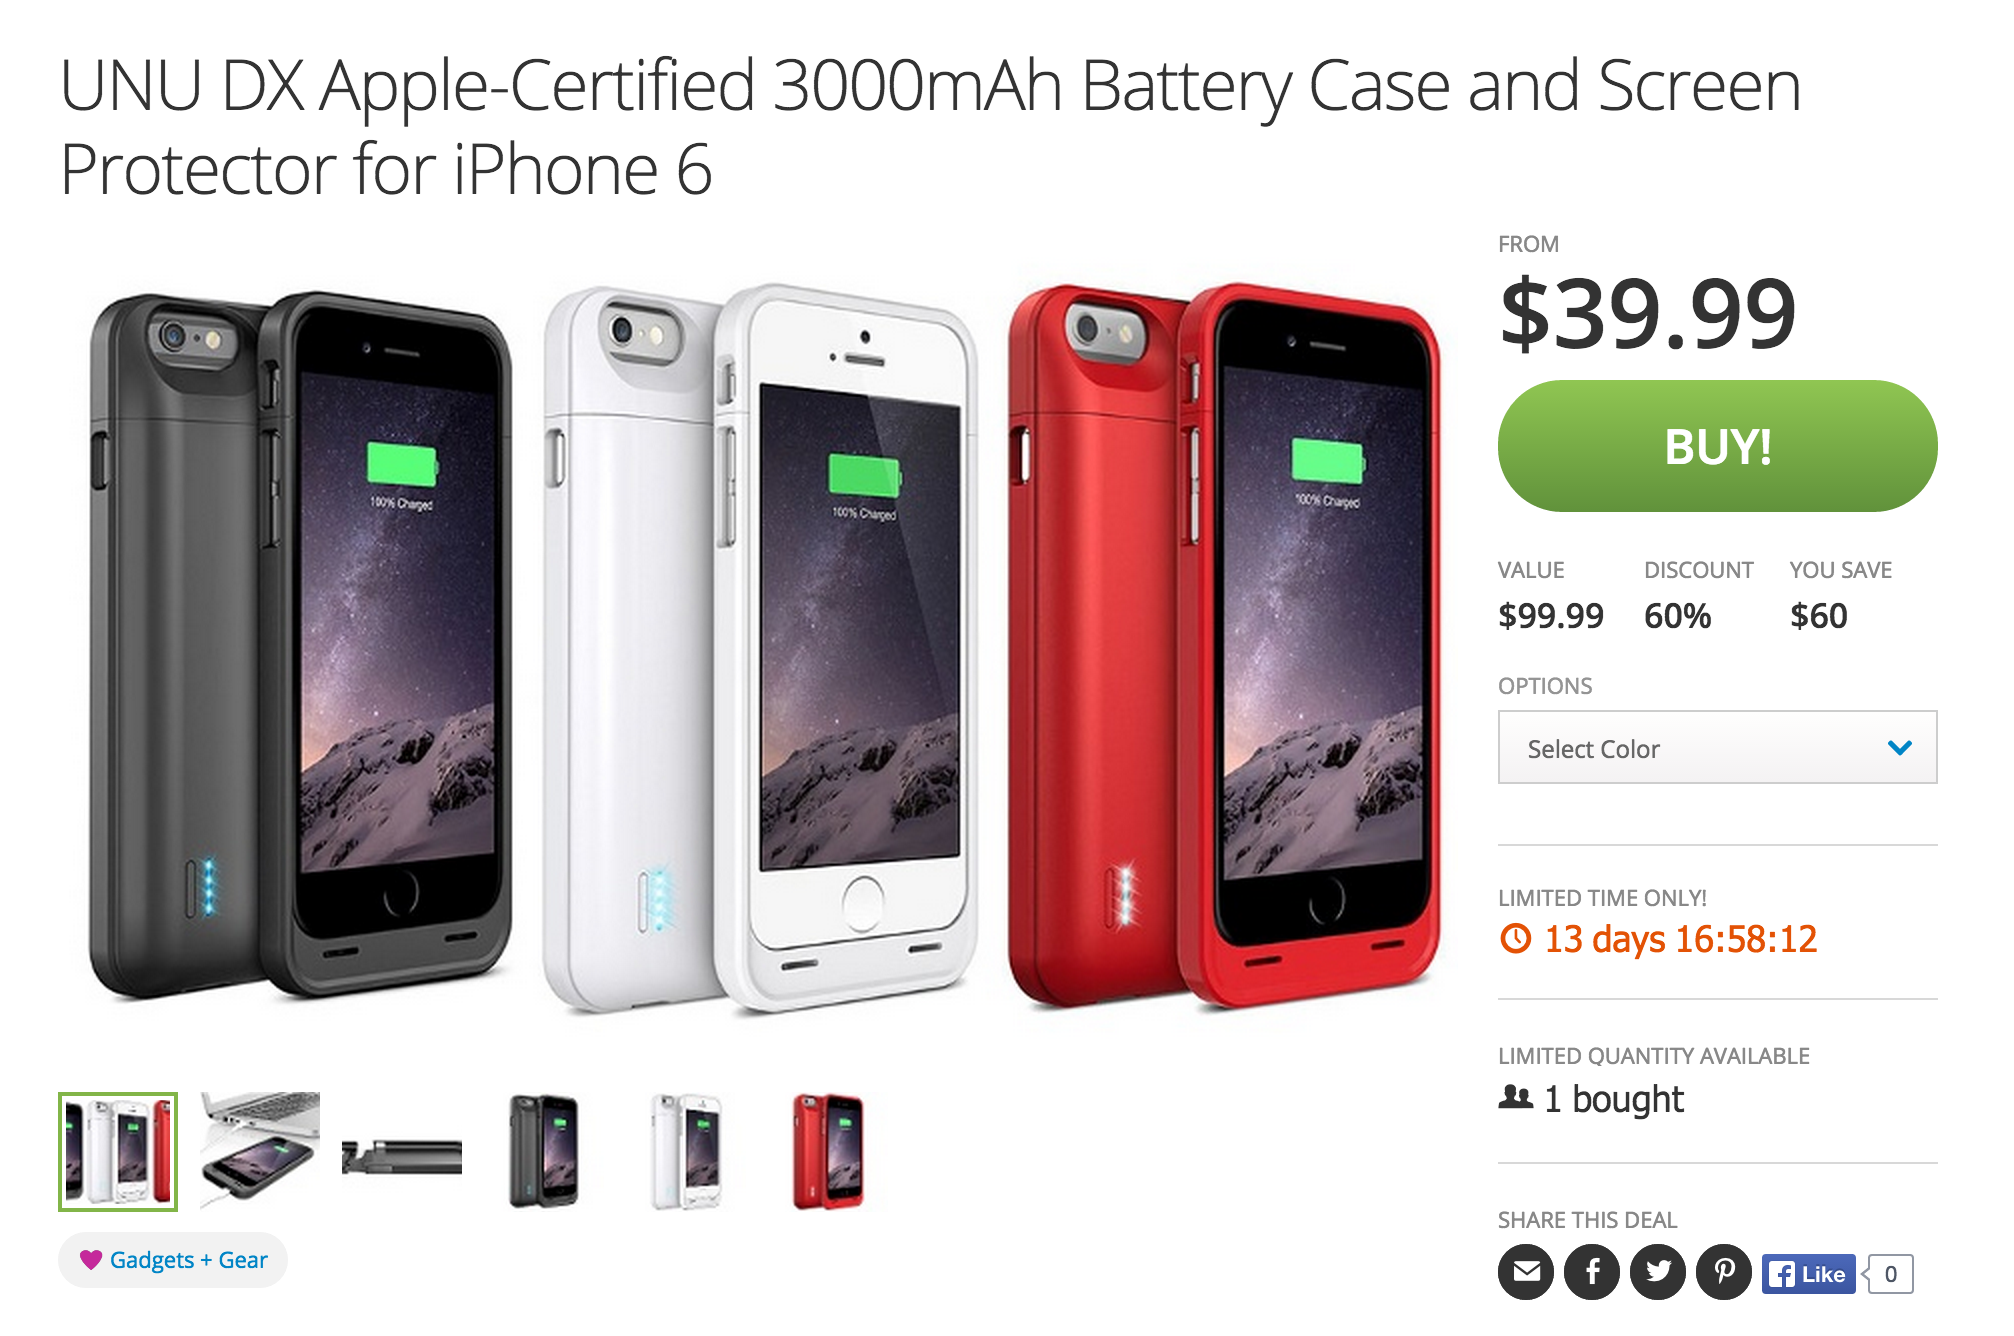 best service 87574 9a84c uNu DX iPhone 6 MFi 3,000mAh Battery Case (multiple colors) $40 ...